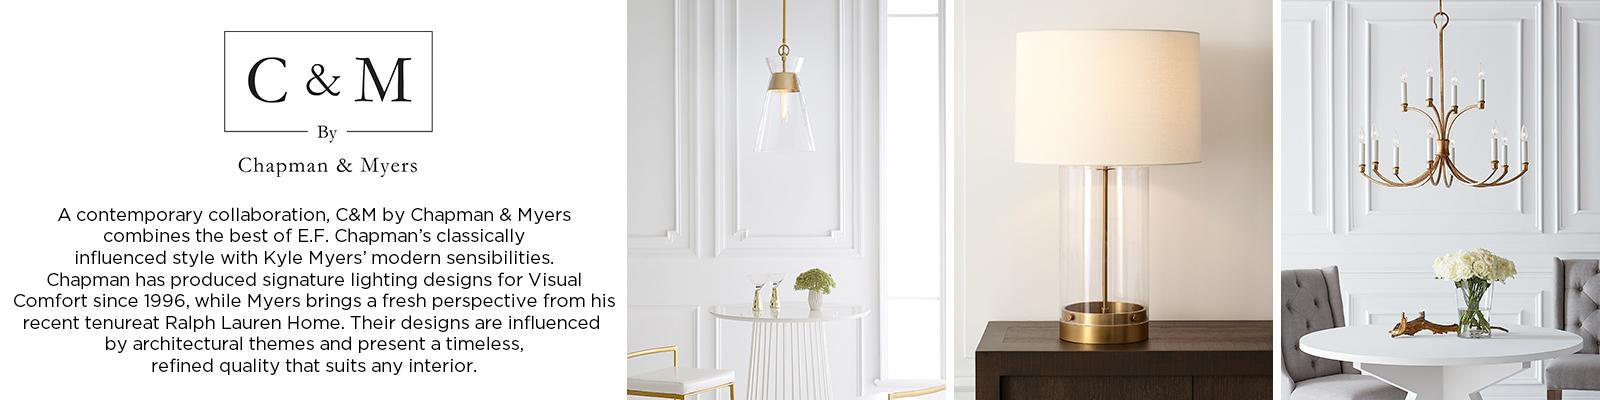 C & M By Chapman & Myers Lighting